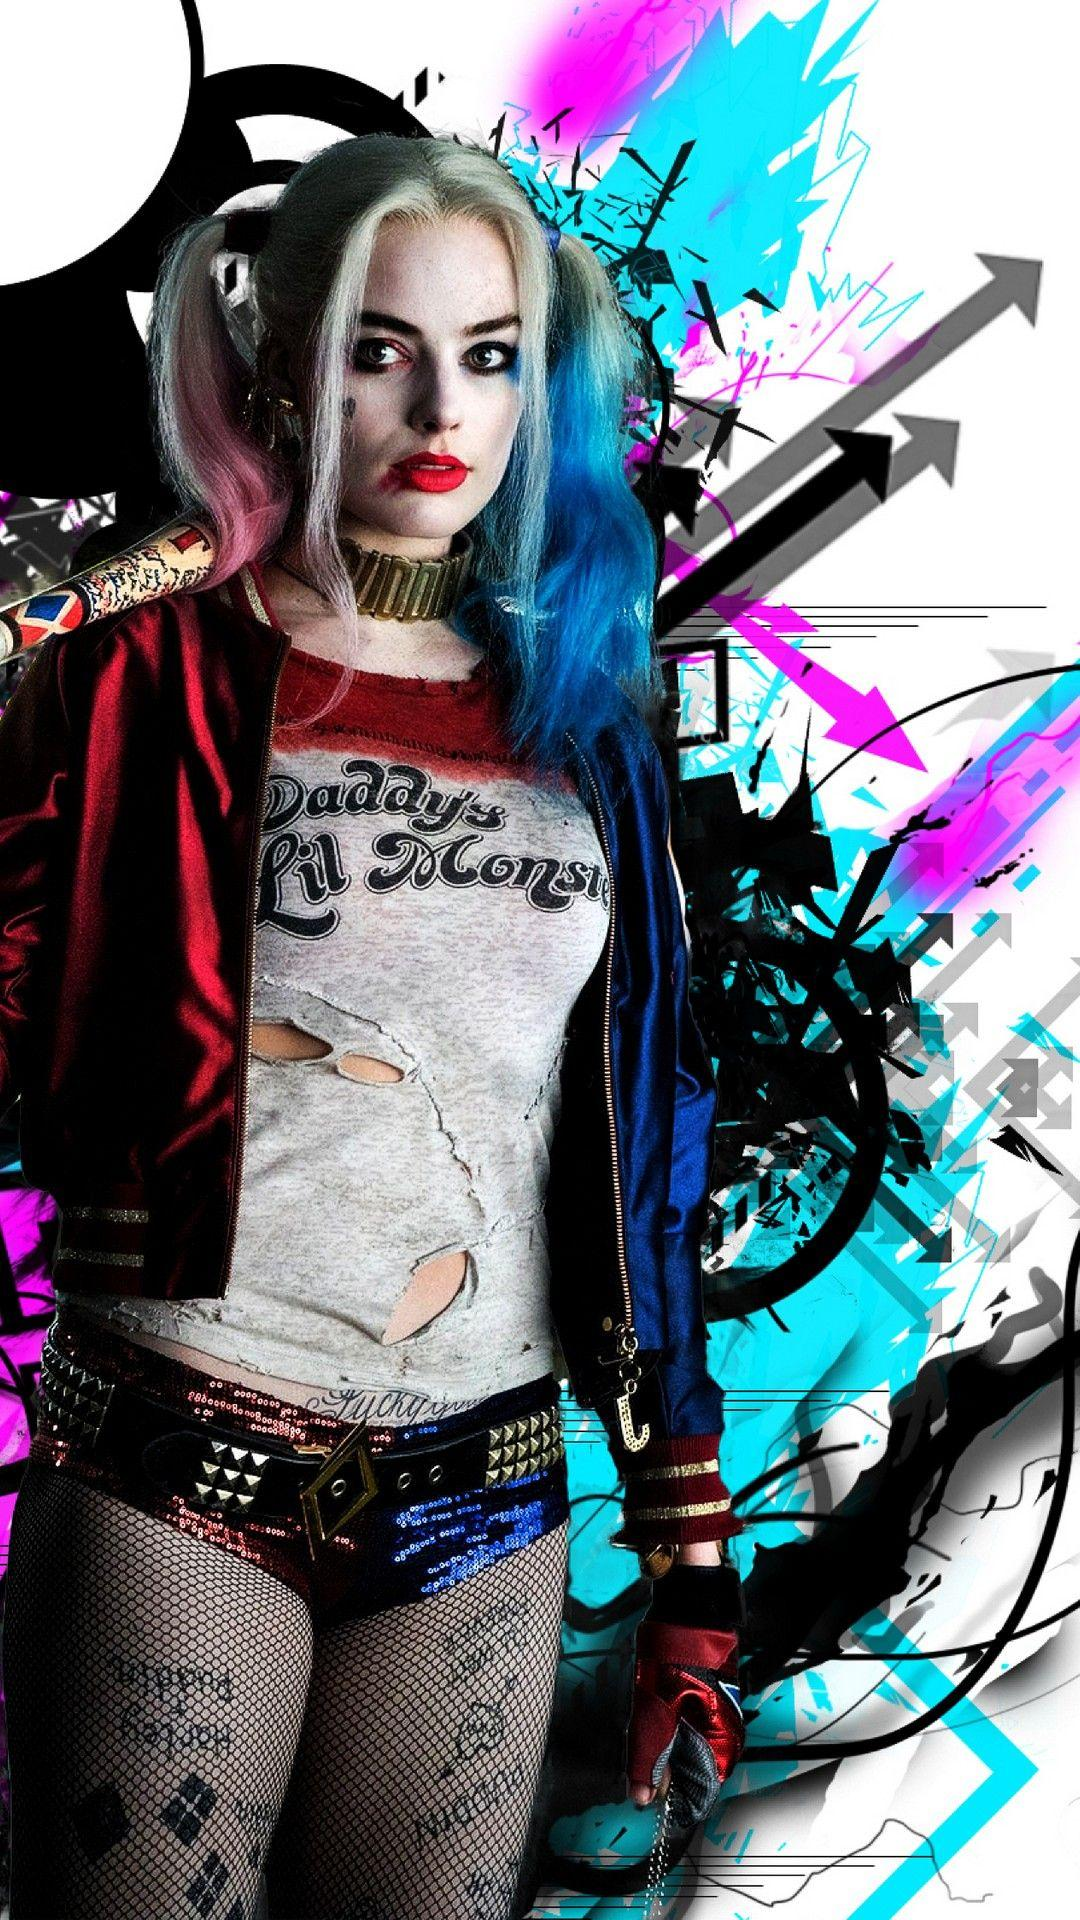 Phone Harley Quinn Wallpapers Wallpaper Cave